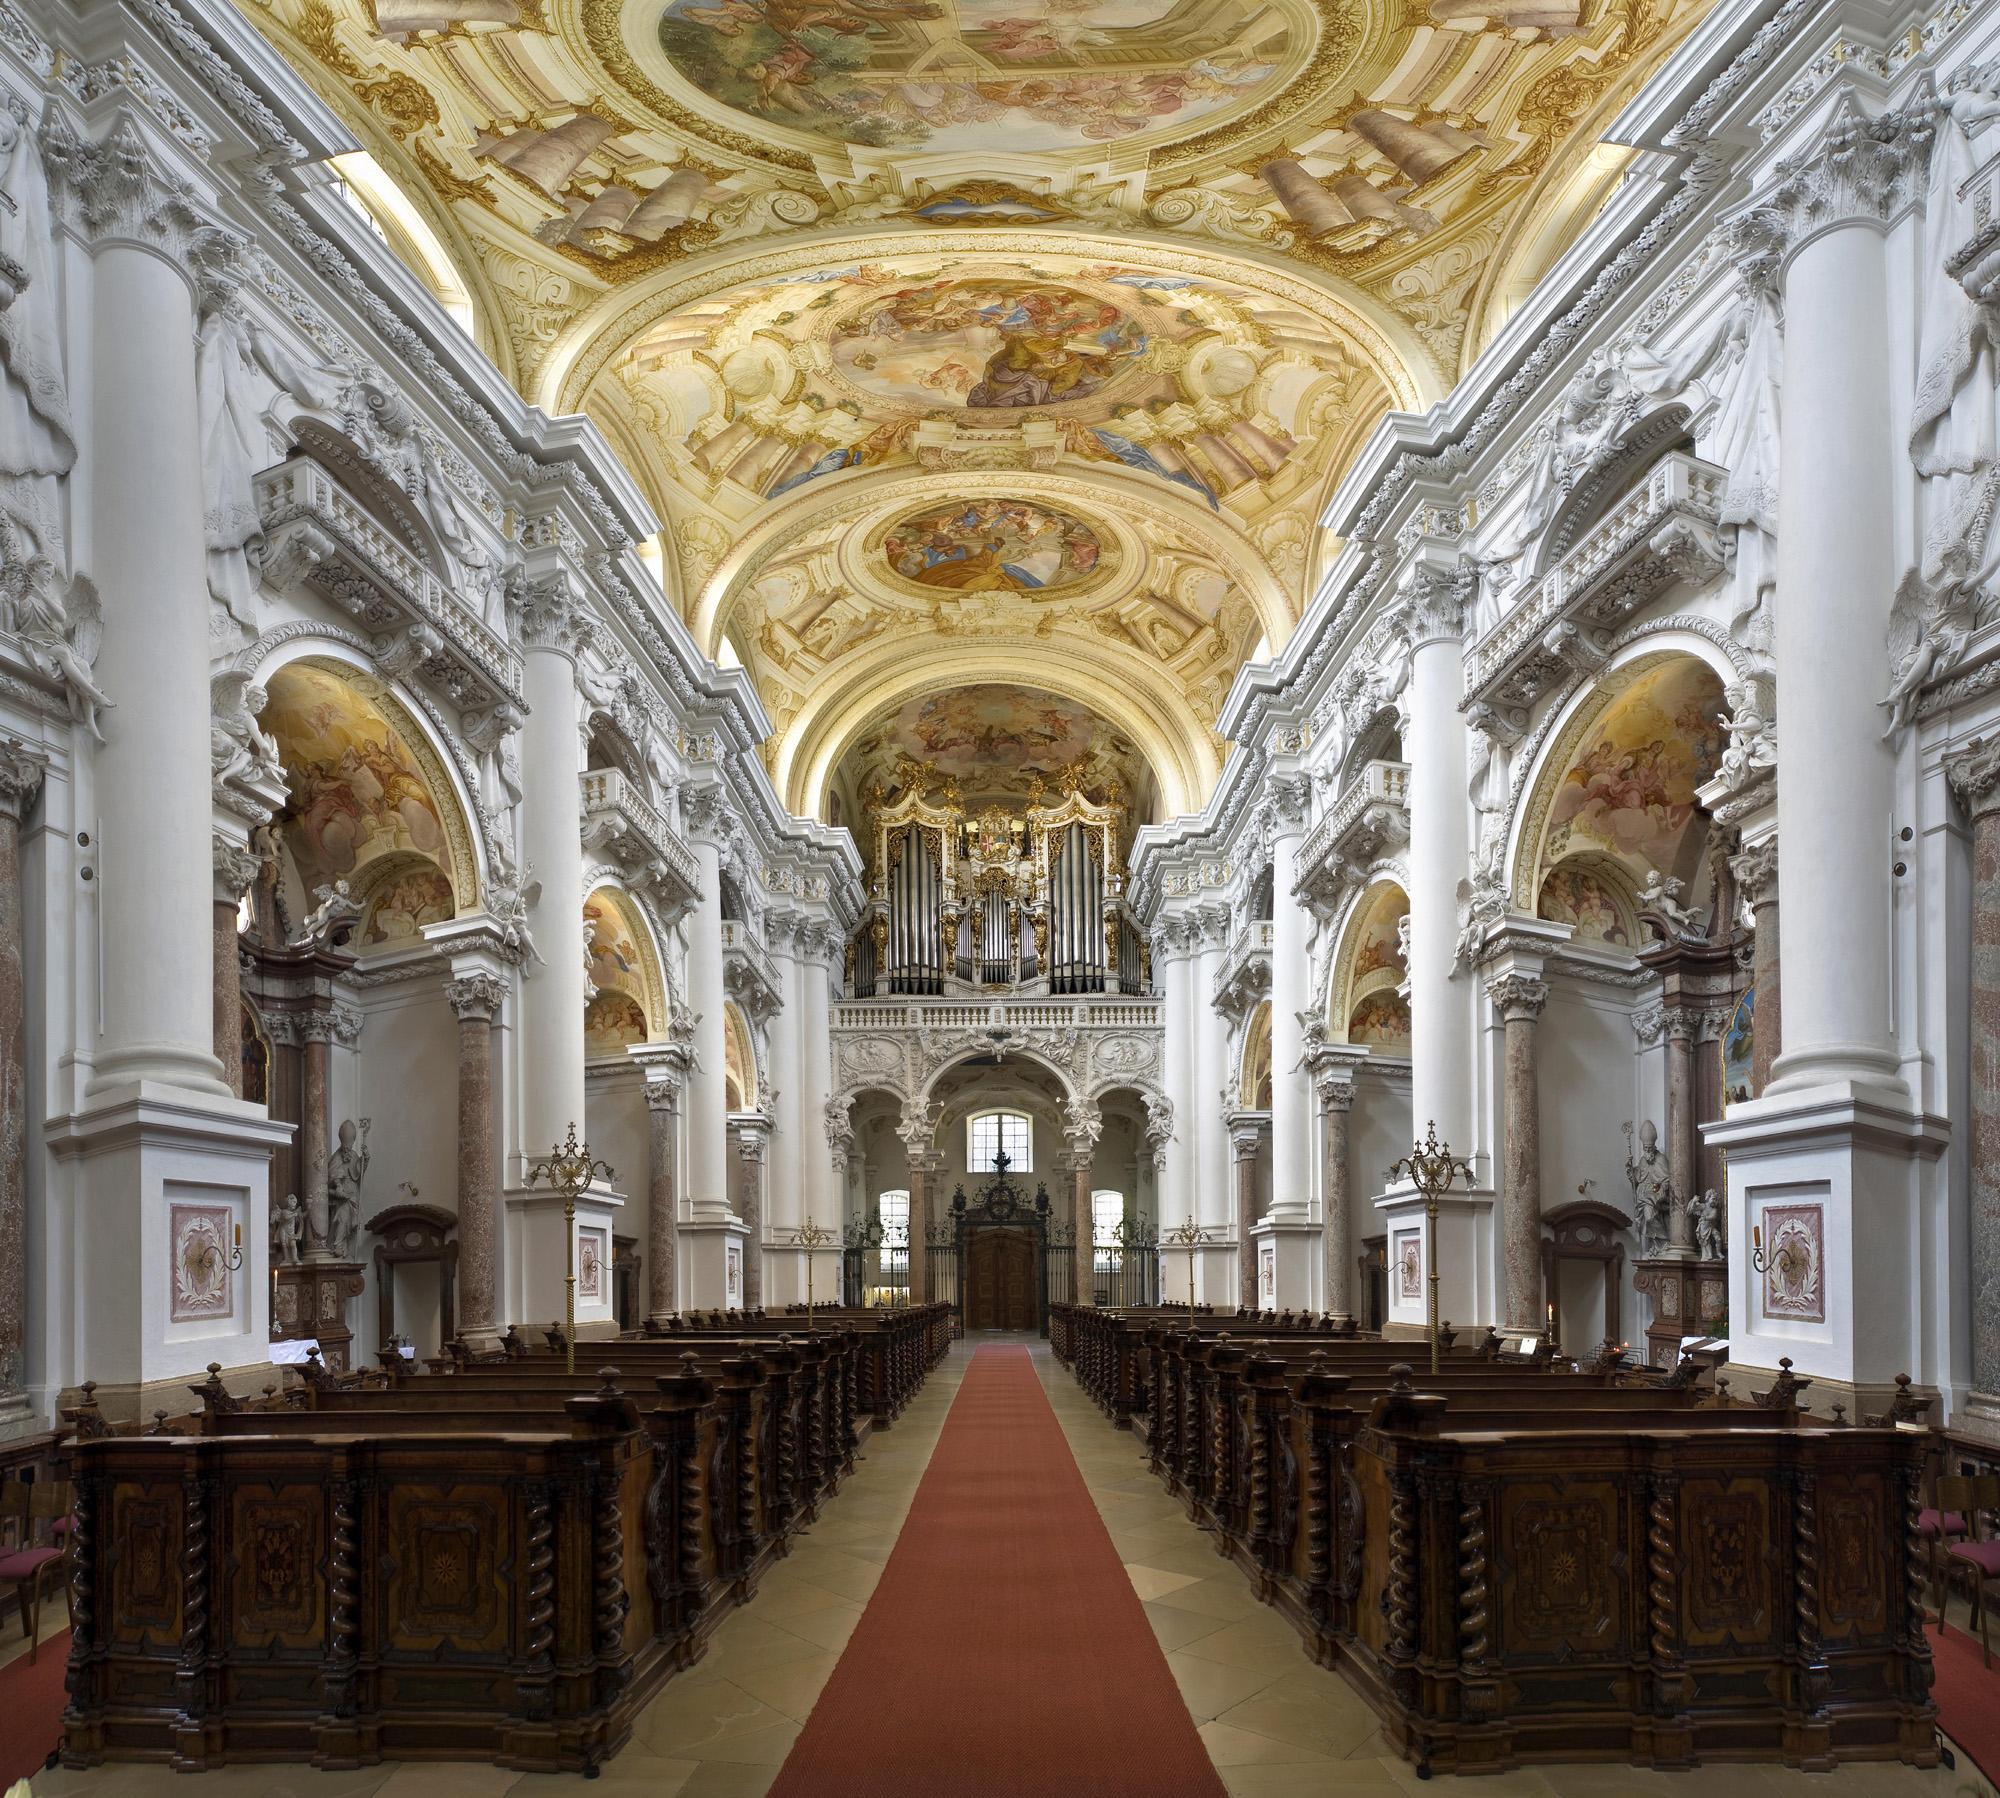 Brucknerorgel im Stift St. Florian - Foto: Stift St. Florian